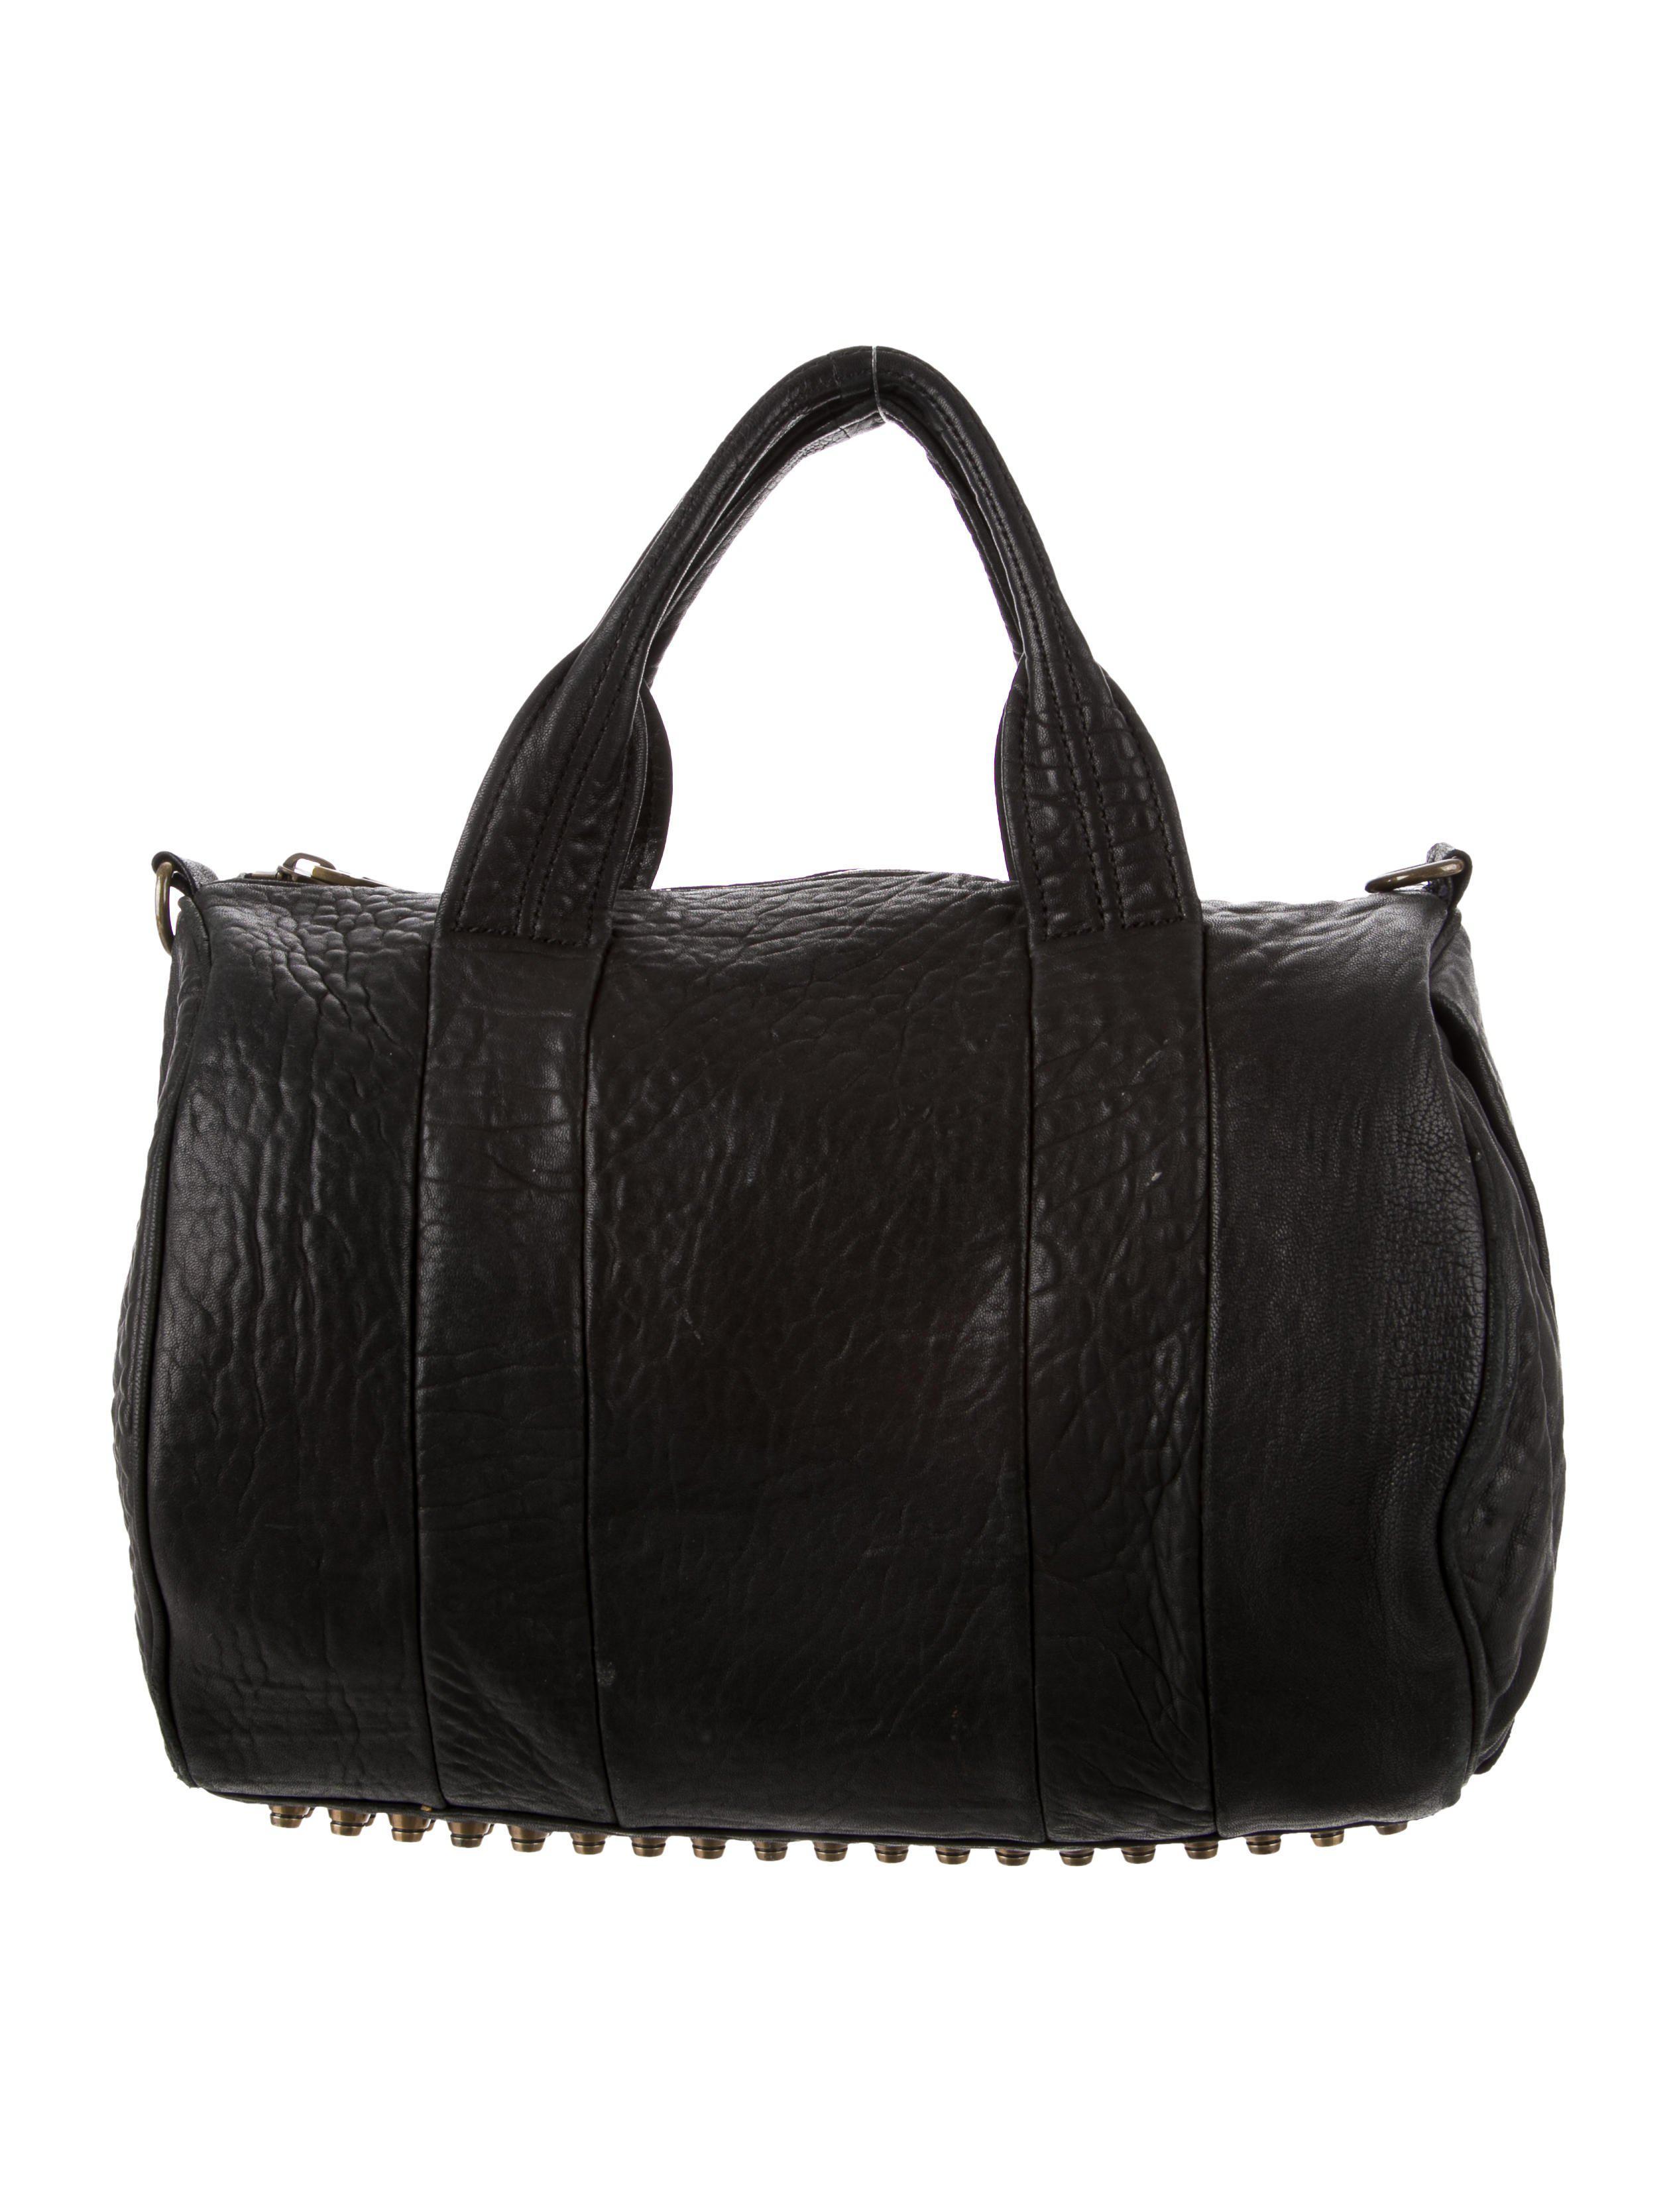 6777f62ecd10 Lyst - Alexander Wang Rocco Duffel Bag Black in Metallic